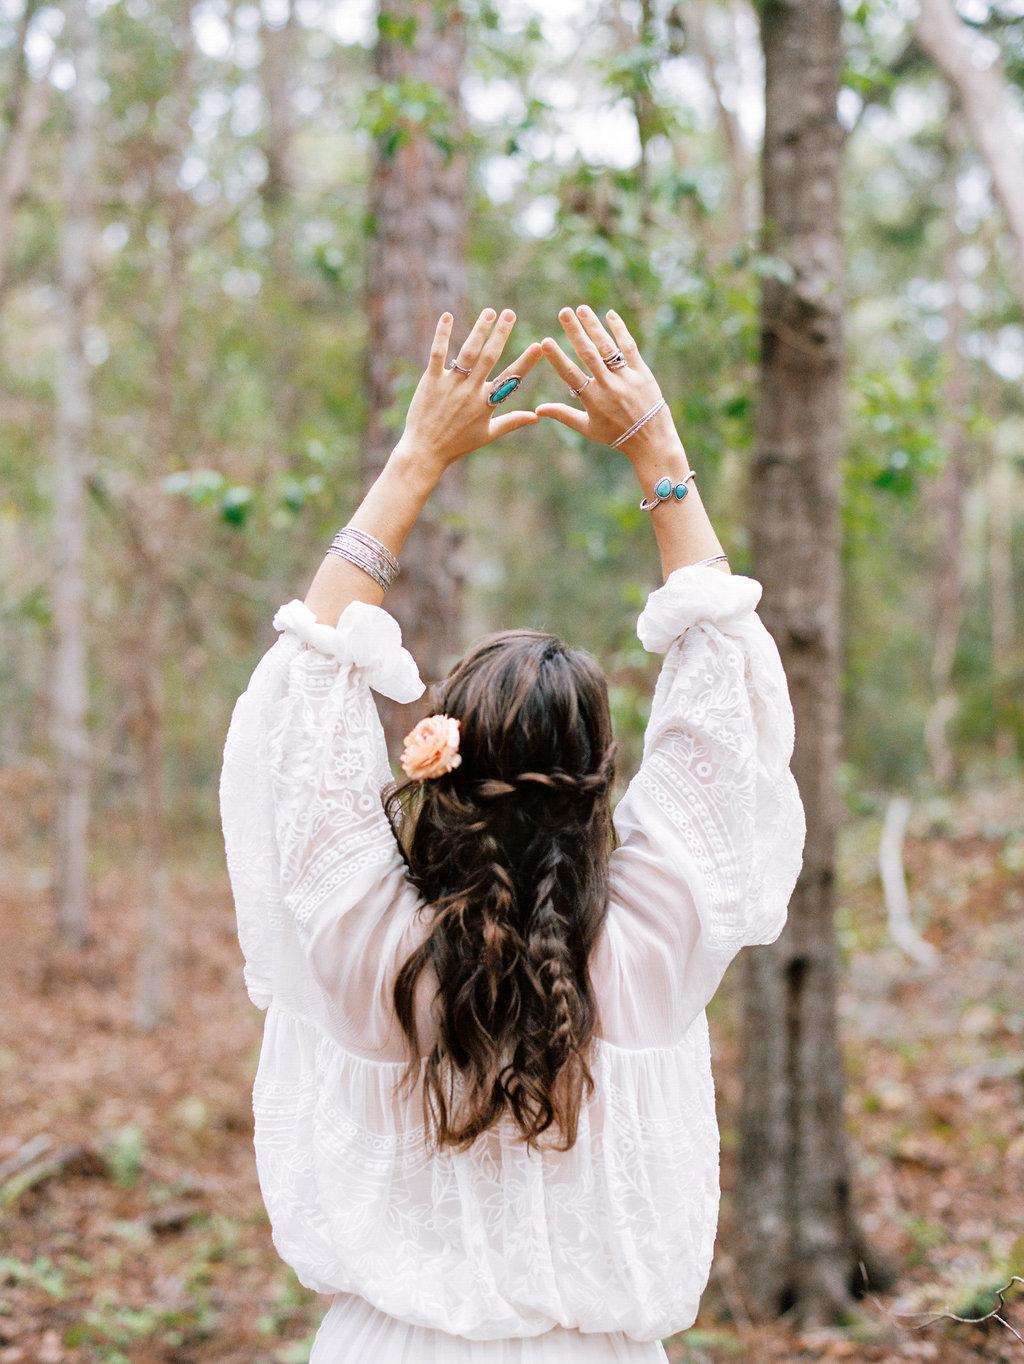 jacksonville-wedding-photographer-forest-elopement-62.jpg